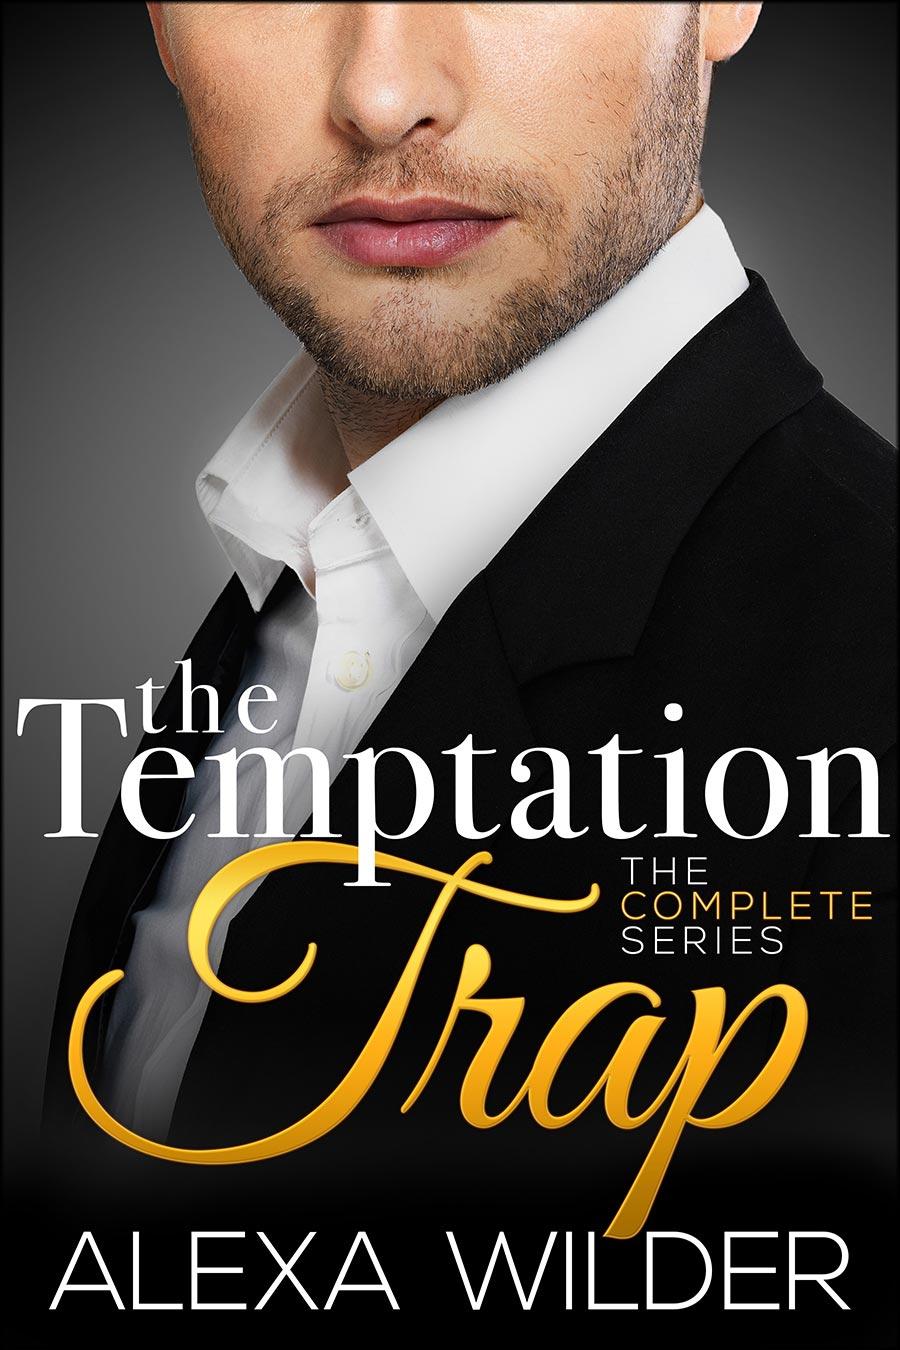 The-Temptation-Trap---450-dpi.jpg